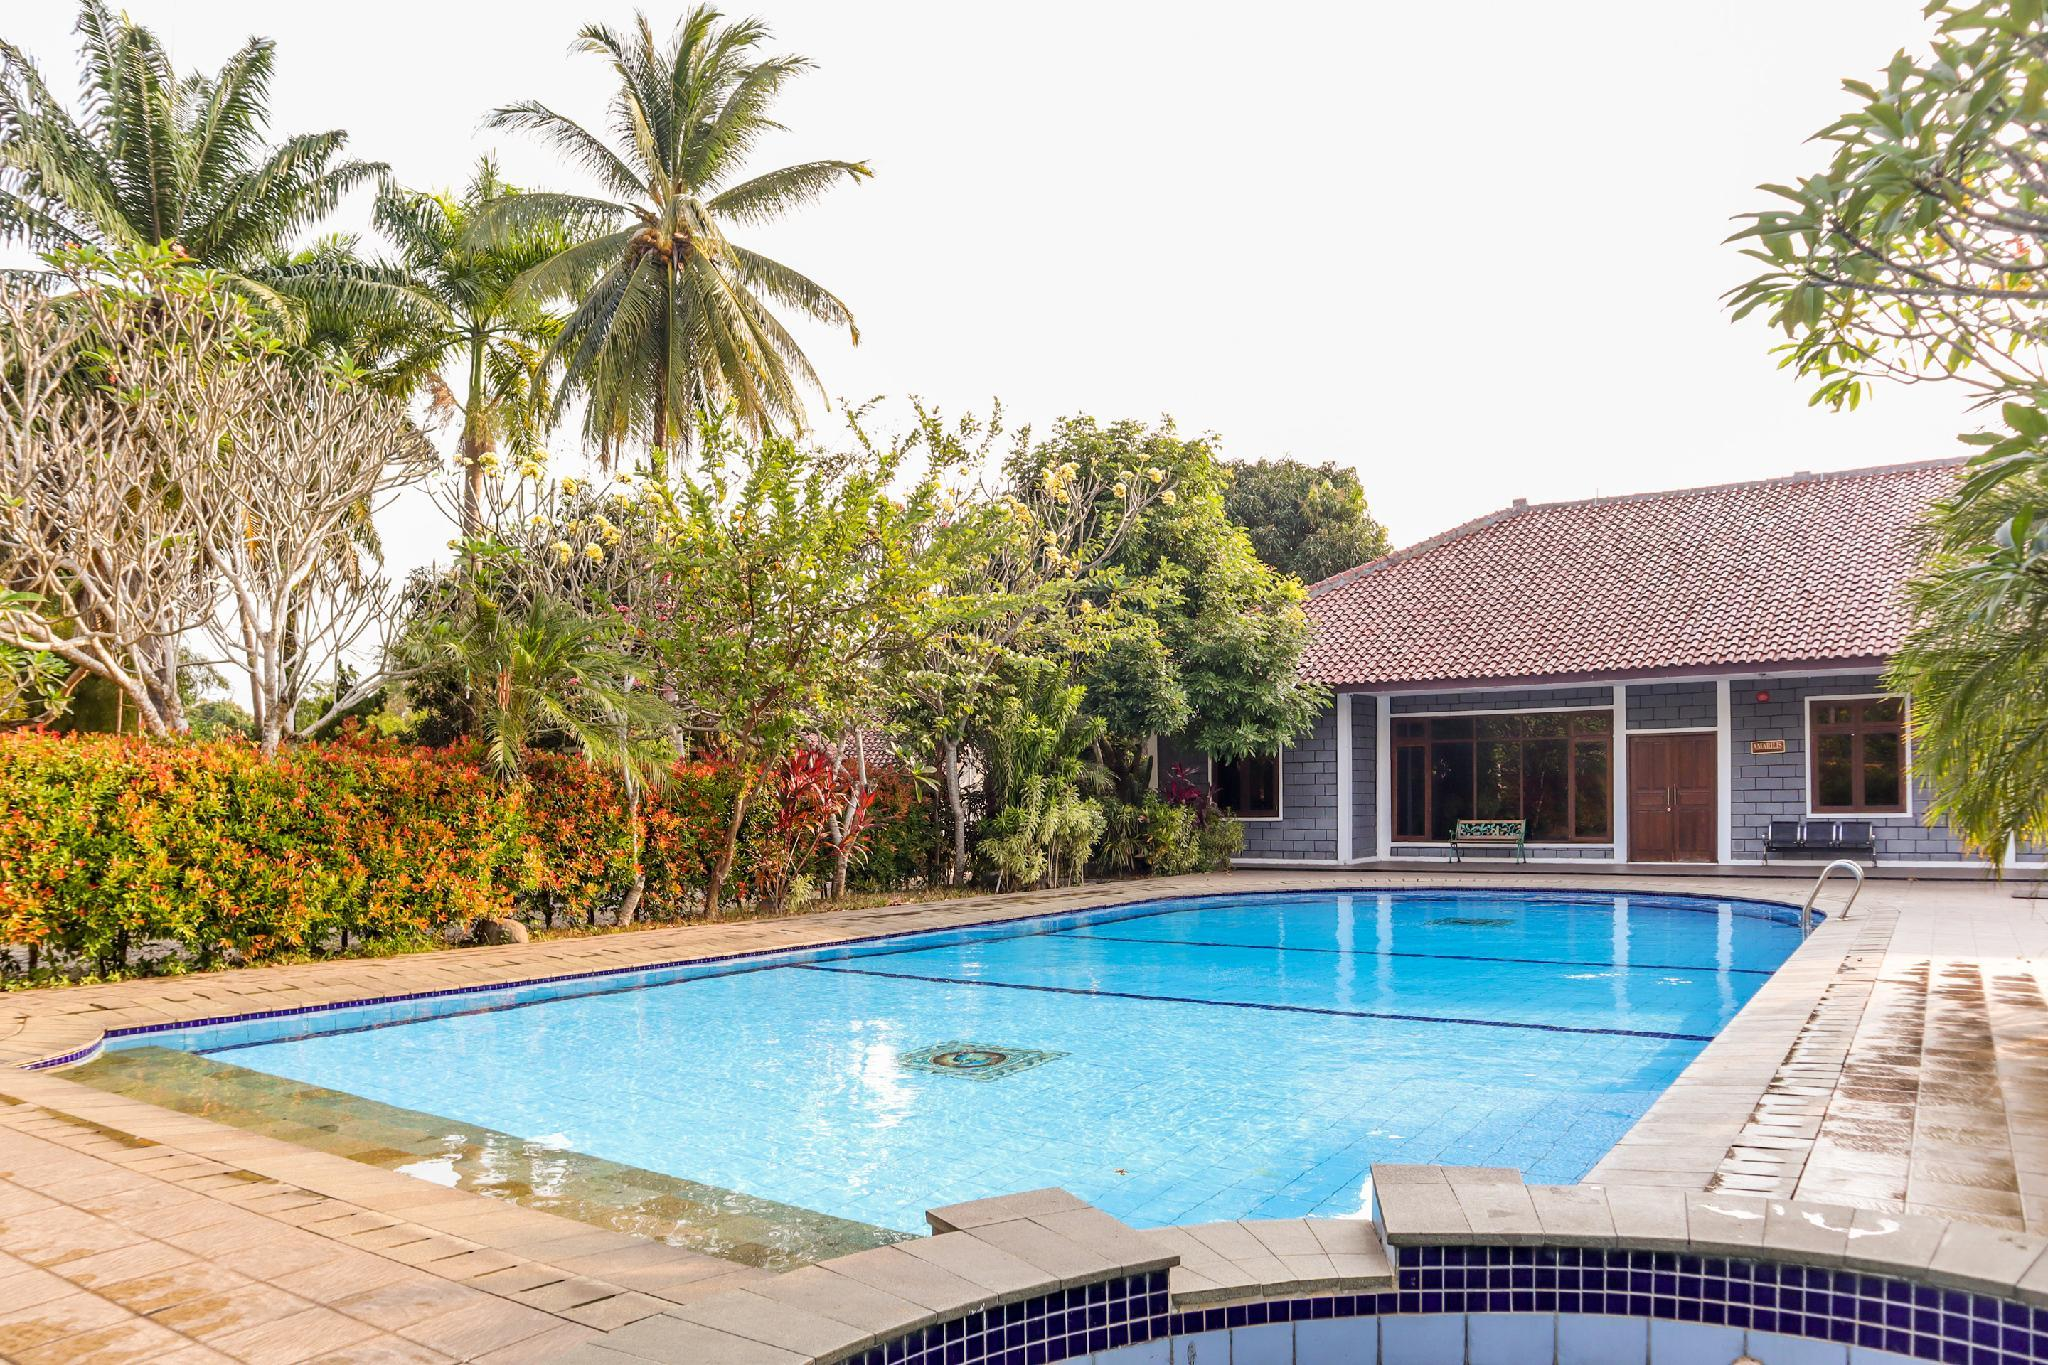 OYO 1395 Carita Asri Villas And Resort